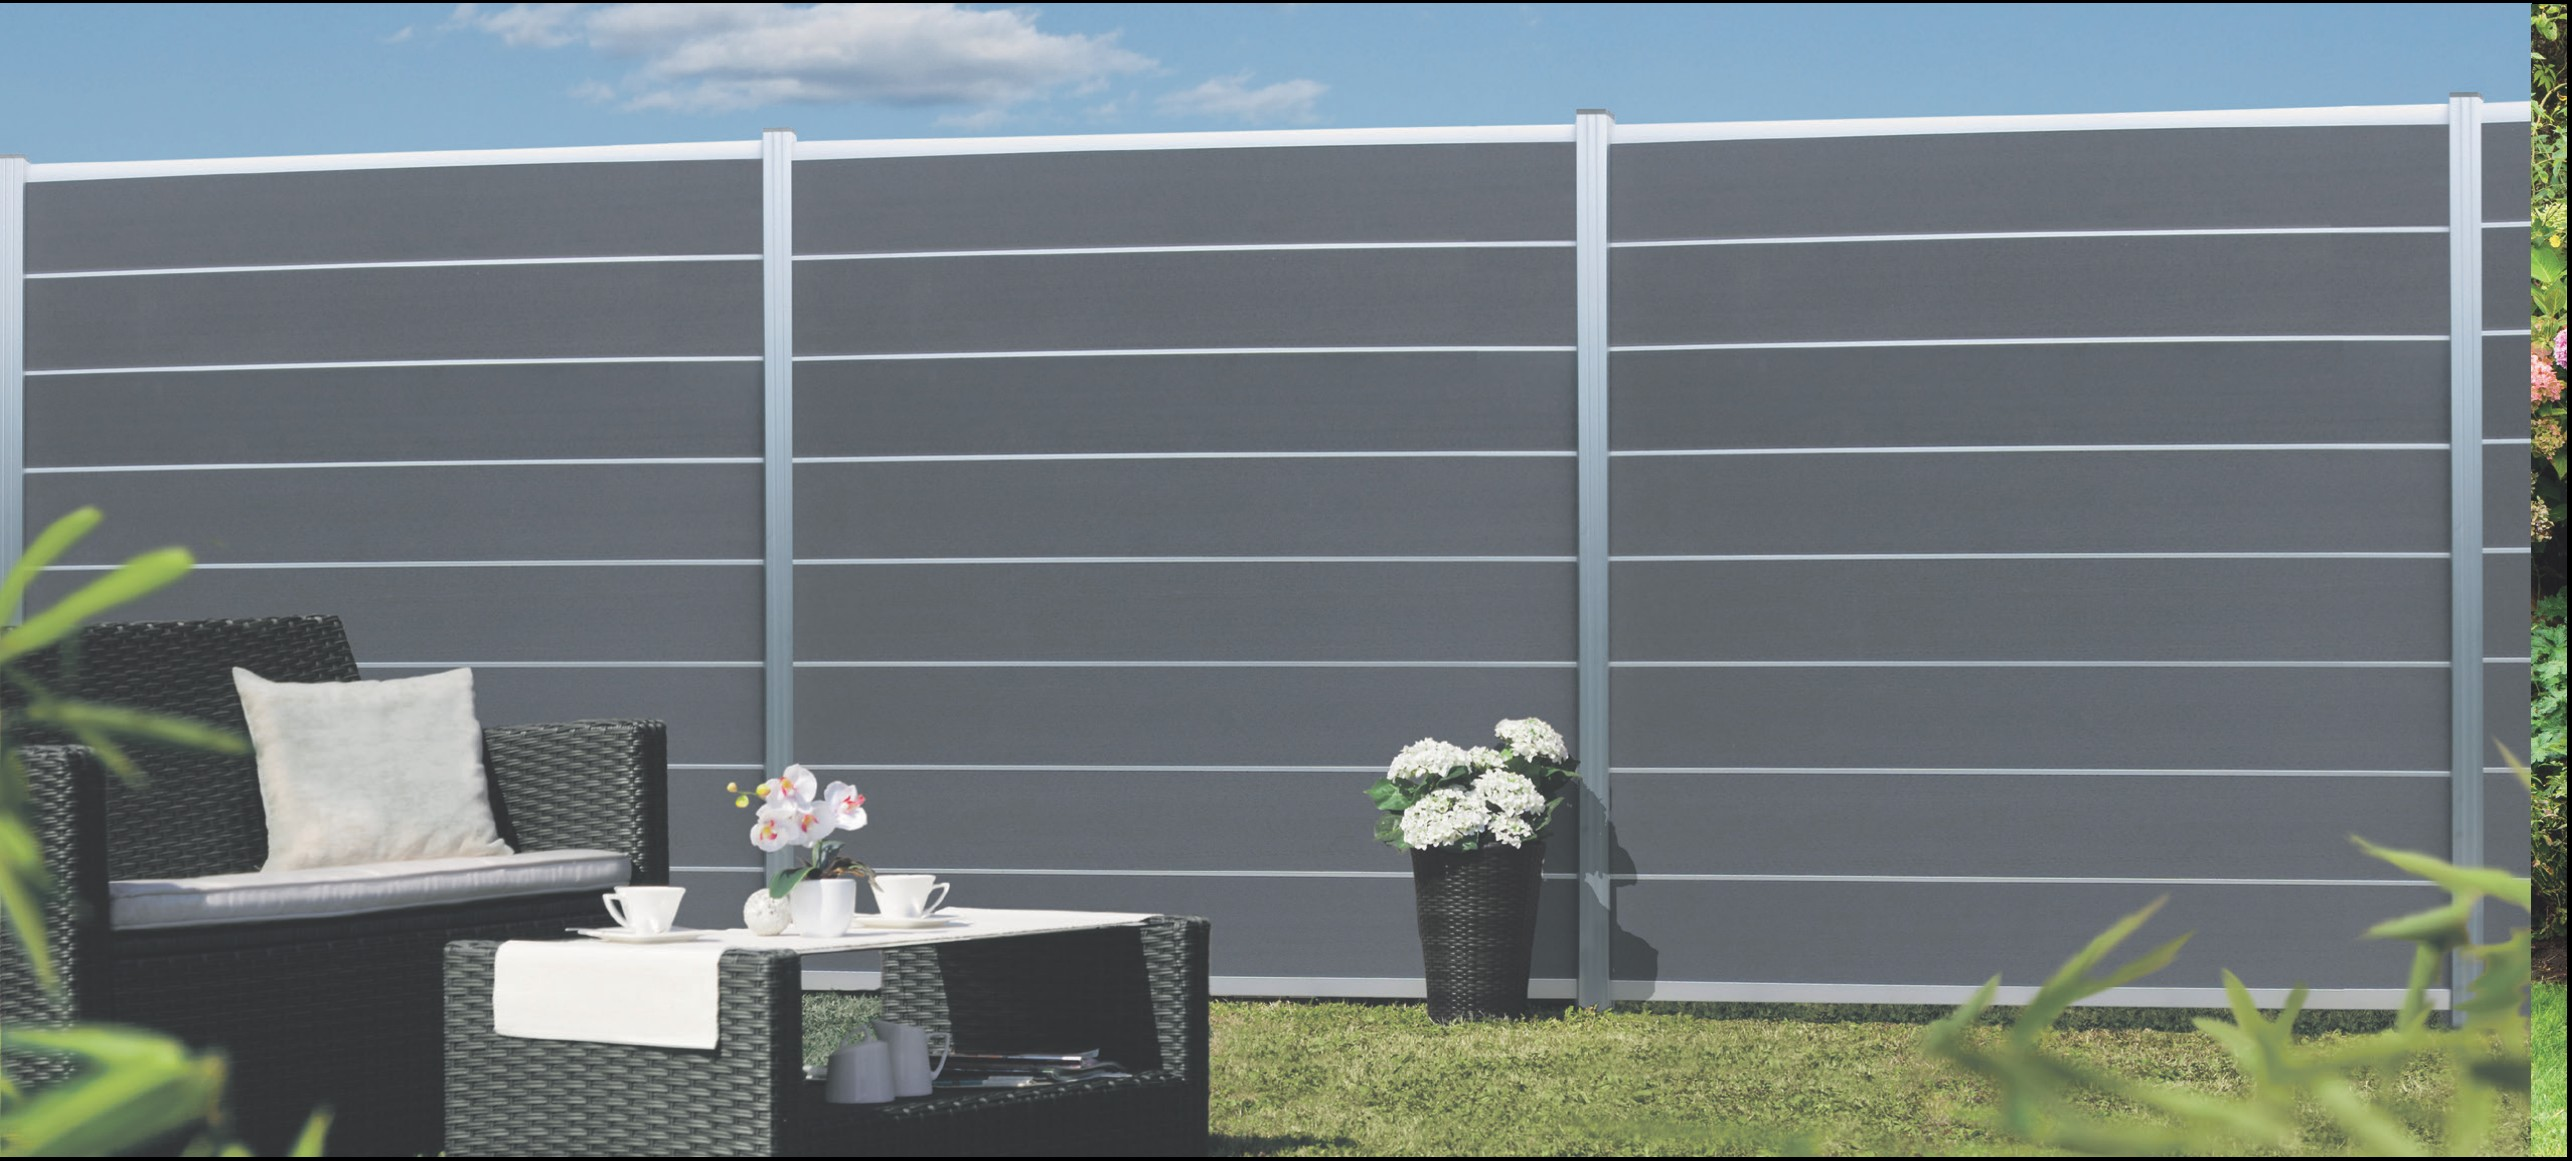 norderney serie wpc steckzaunsystem zaunset f r ein zaunfeld 180x175cm holz genie. Black Bedroom Furniture Sets. Home Design Ideas